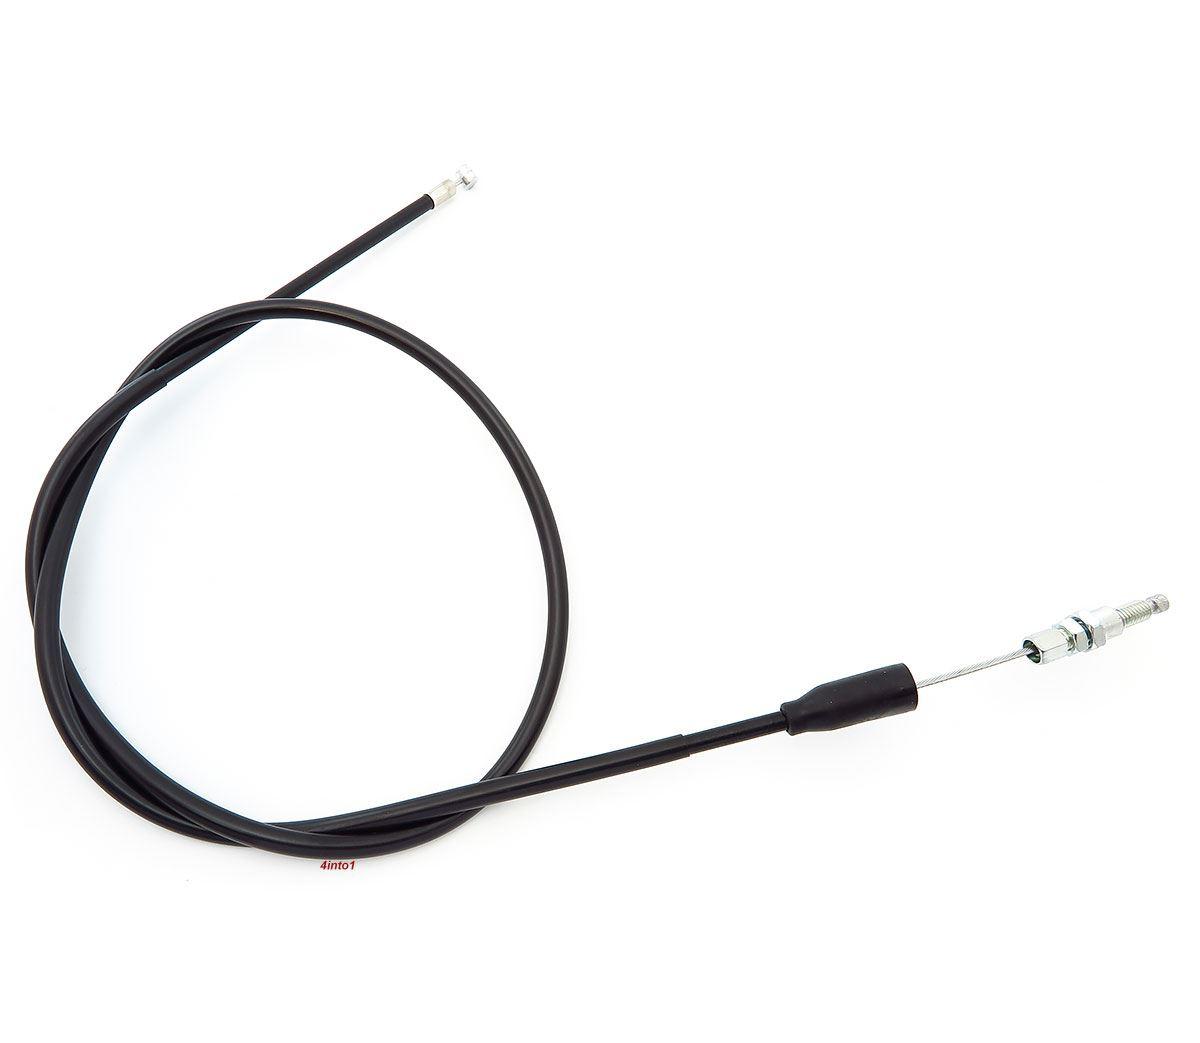 Clutch Cable for Honda CL360 CJ360T CB750 CB750F CB550K CB550 CB360